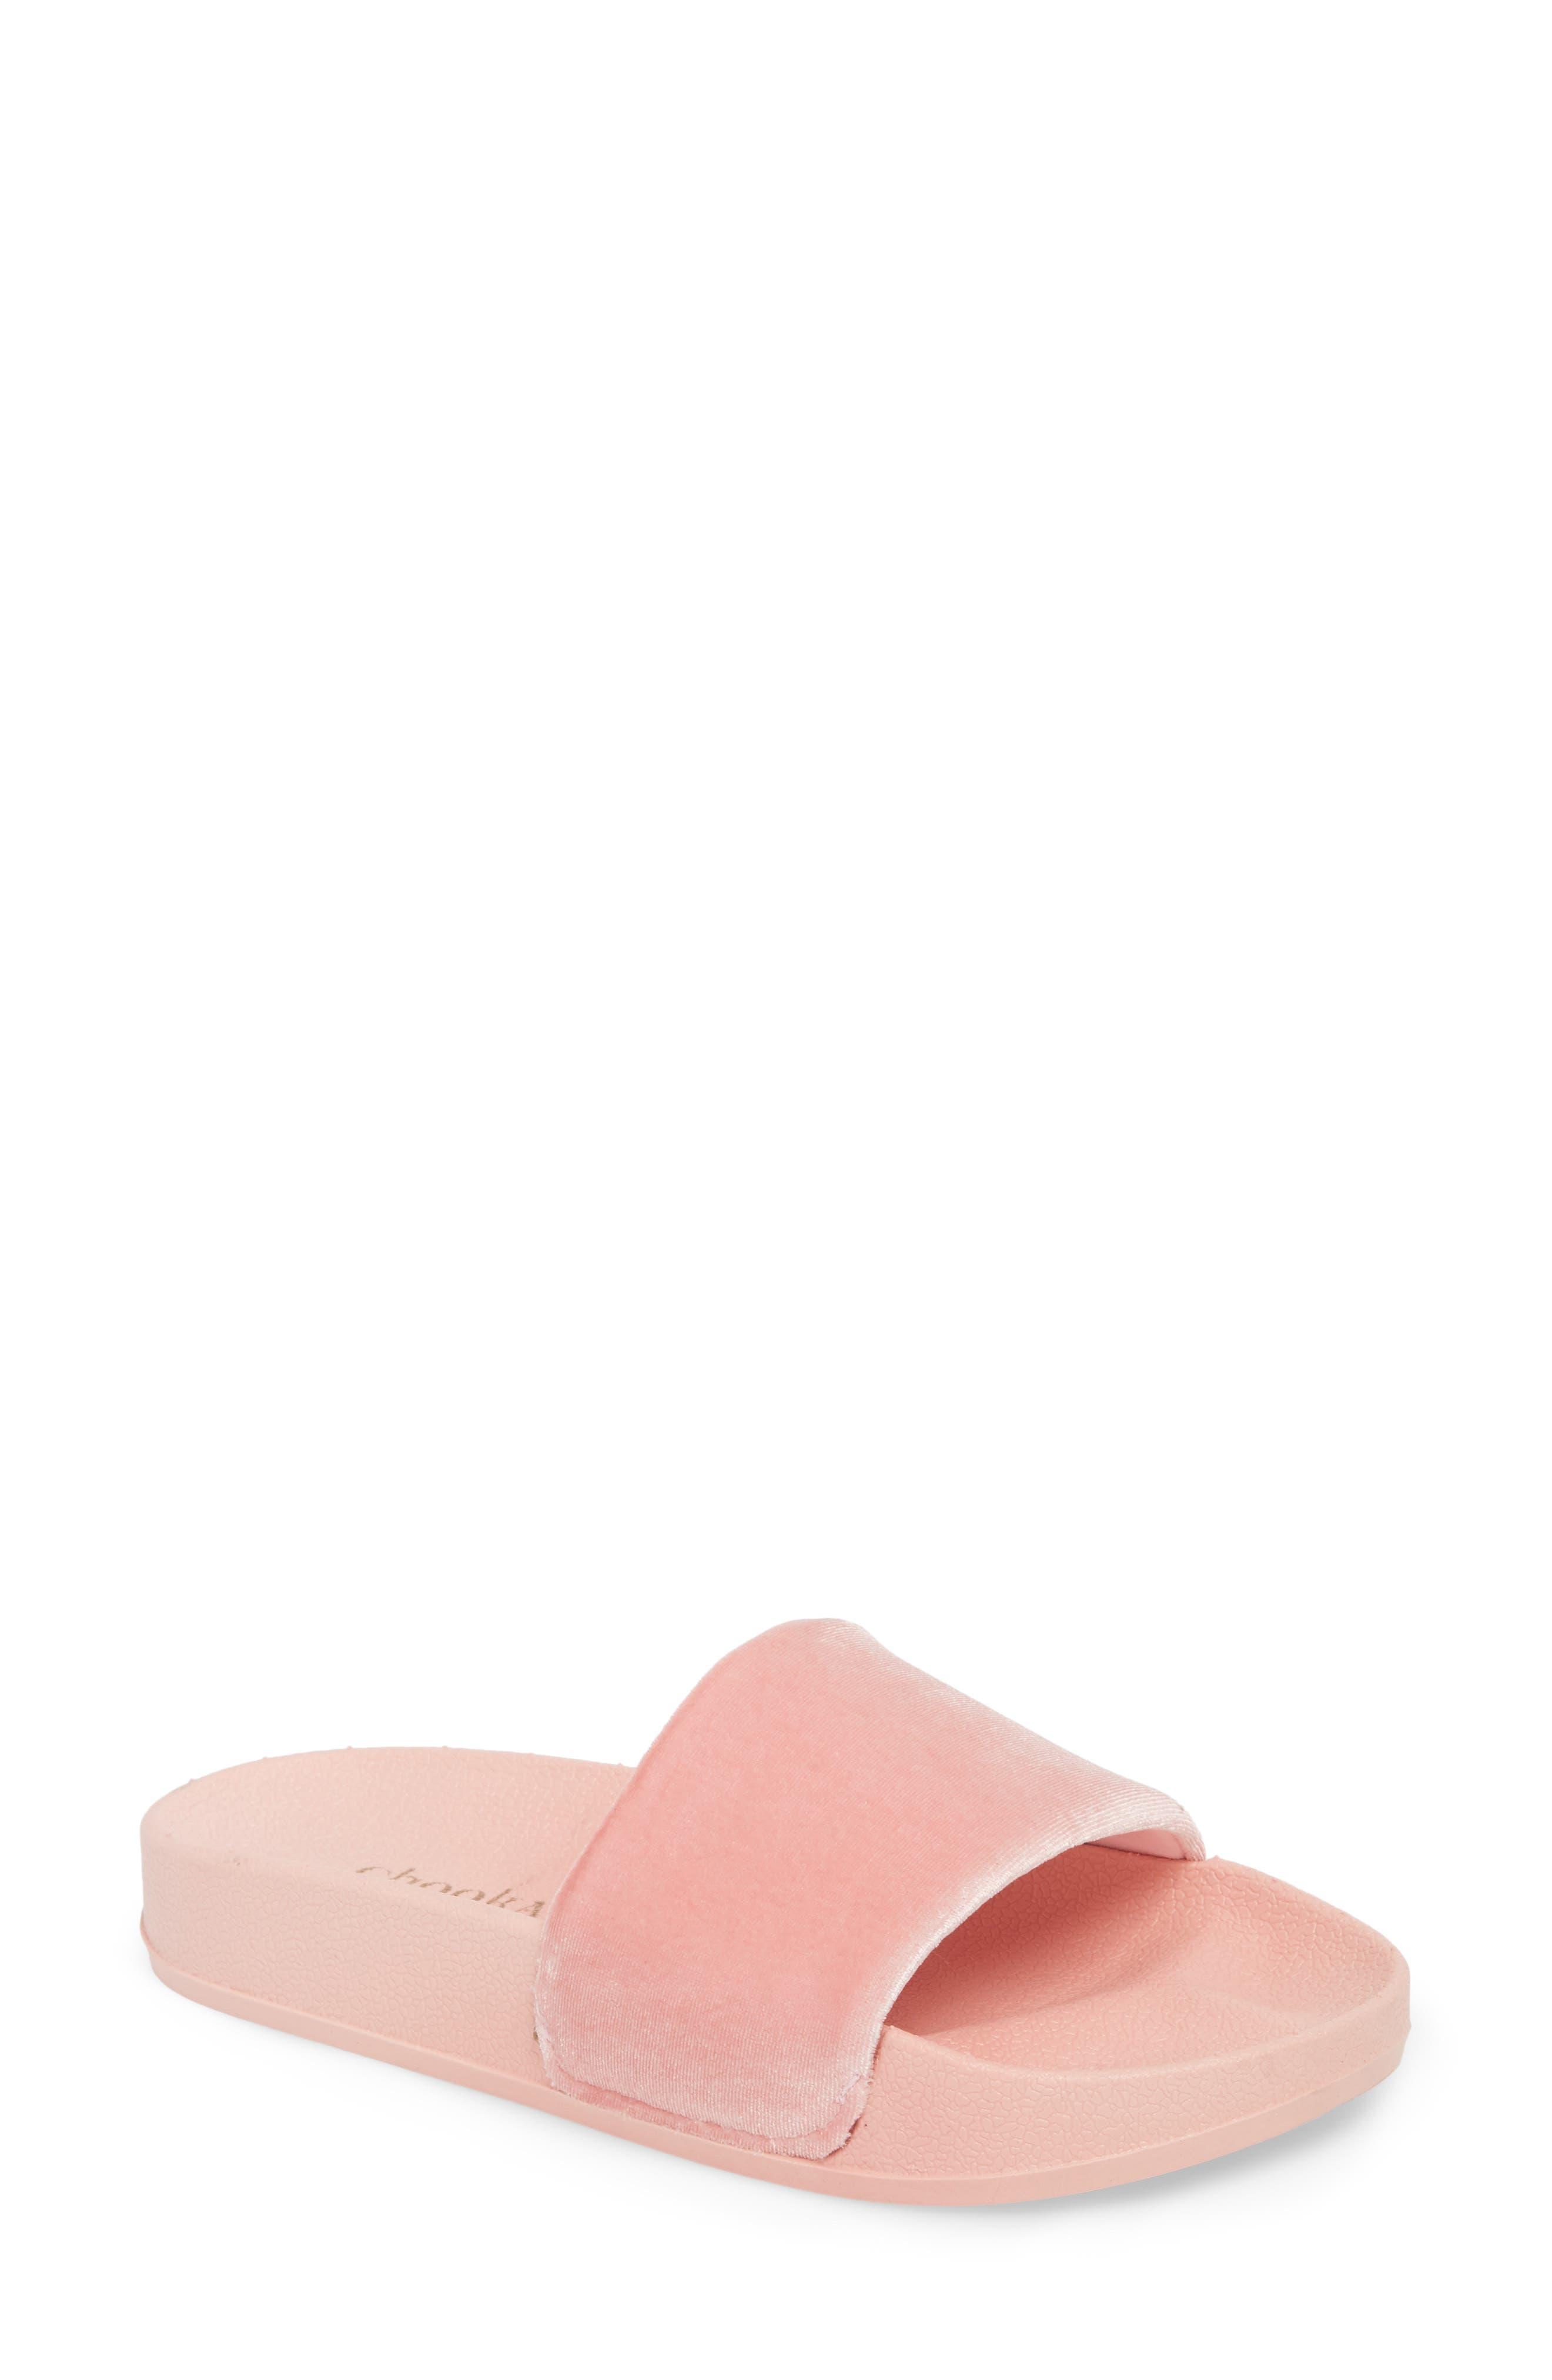 Slide Sandal,                         Main,                         color, Blush